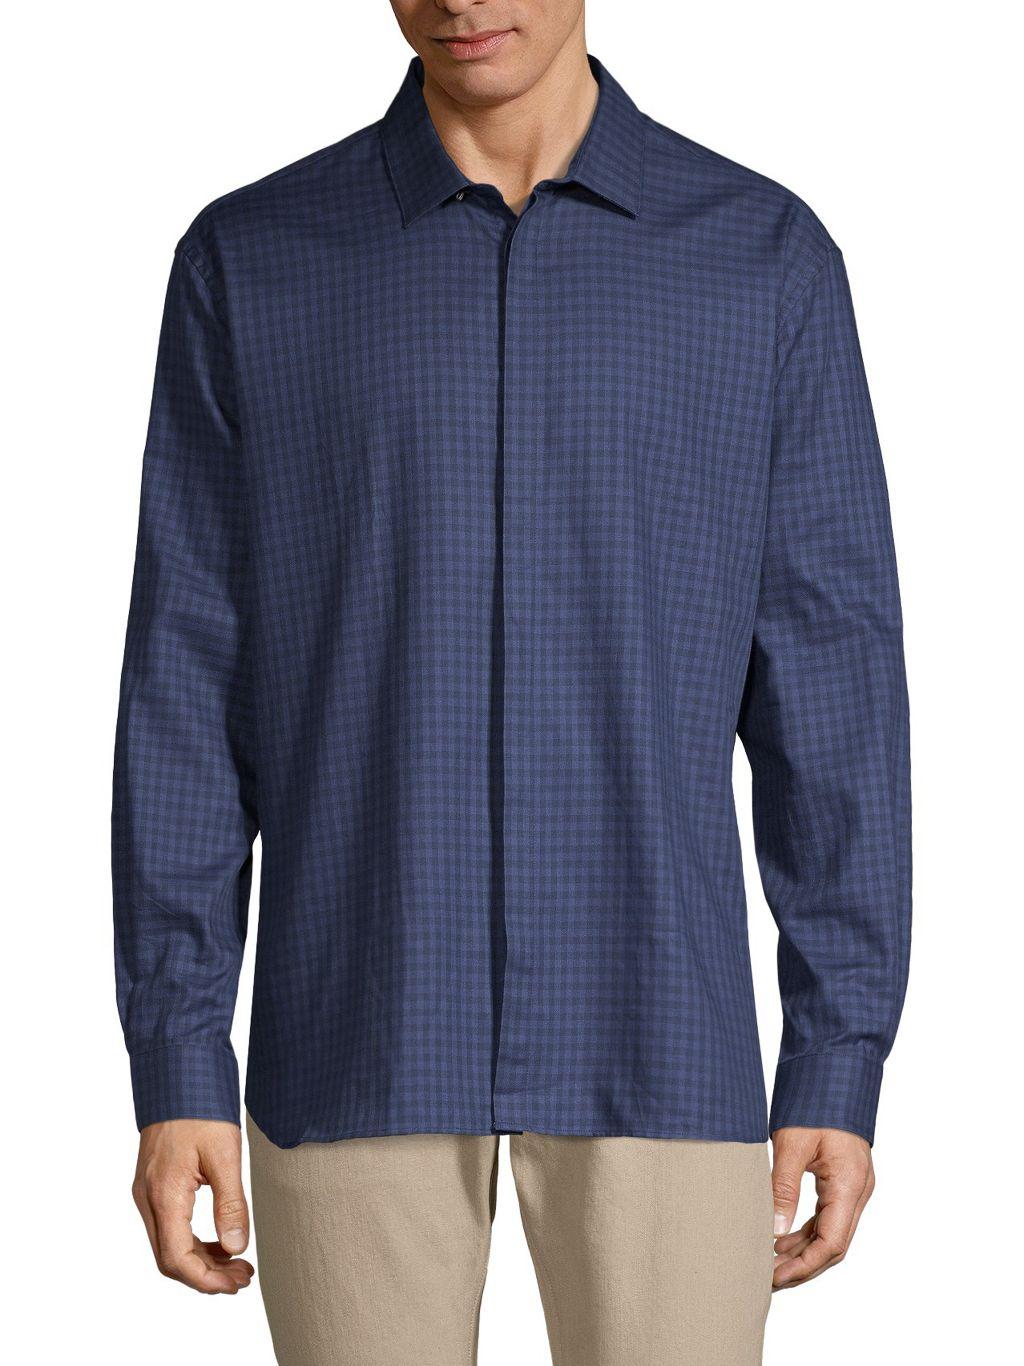 John Varvatos Star U.S.A. Slim-Fit Long-Sleeve Plaid Shirt